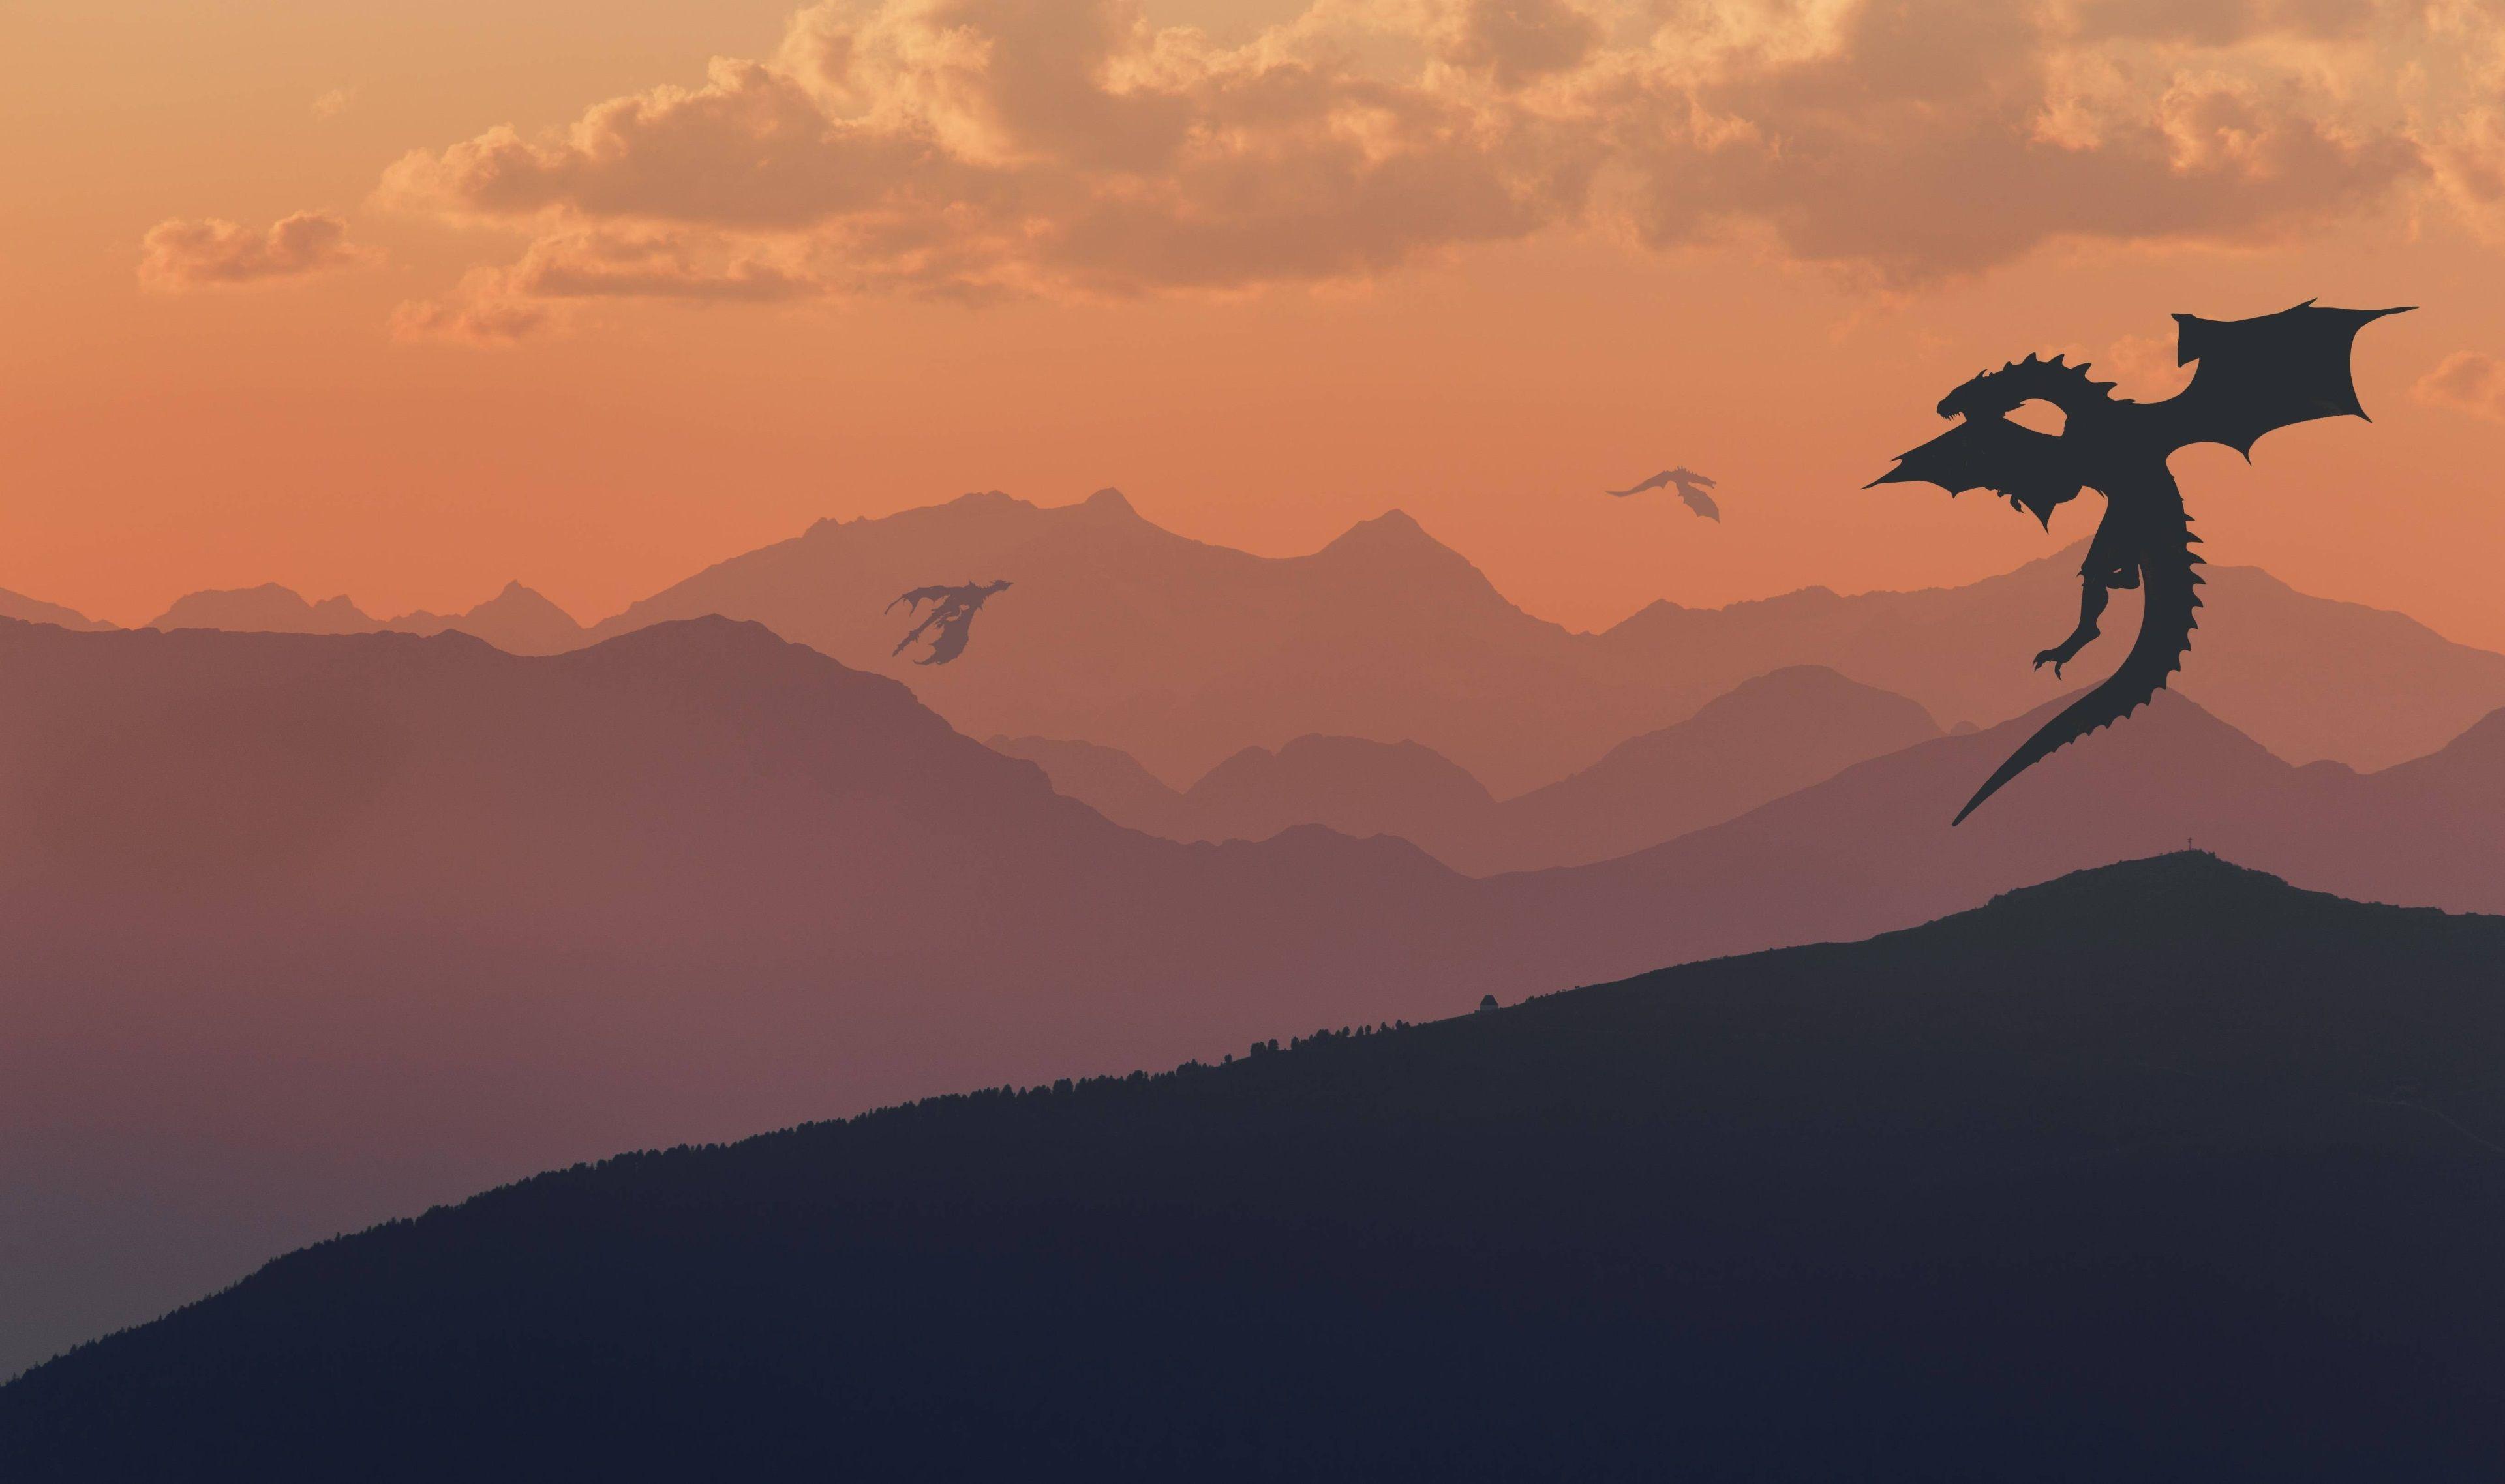 Game Of Thrones Dragons 4K Wallpaper